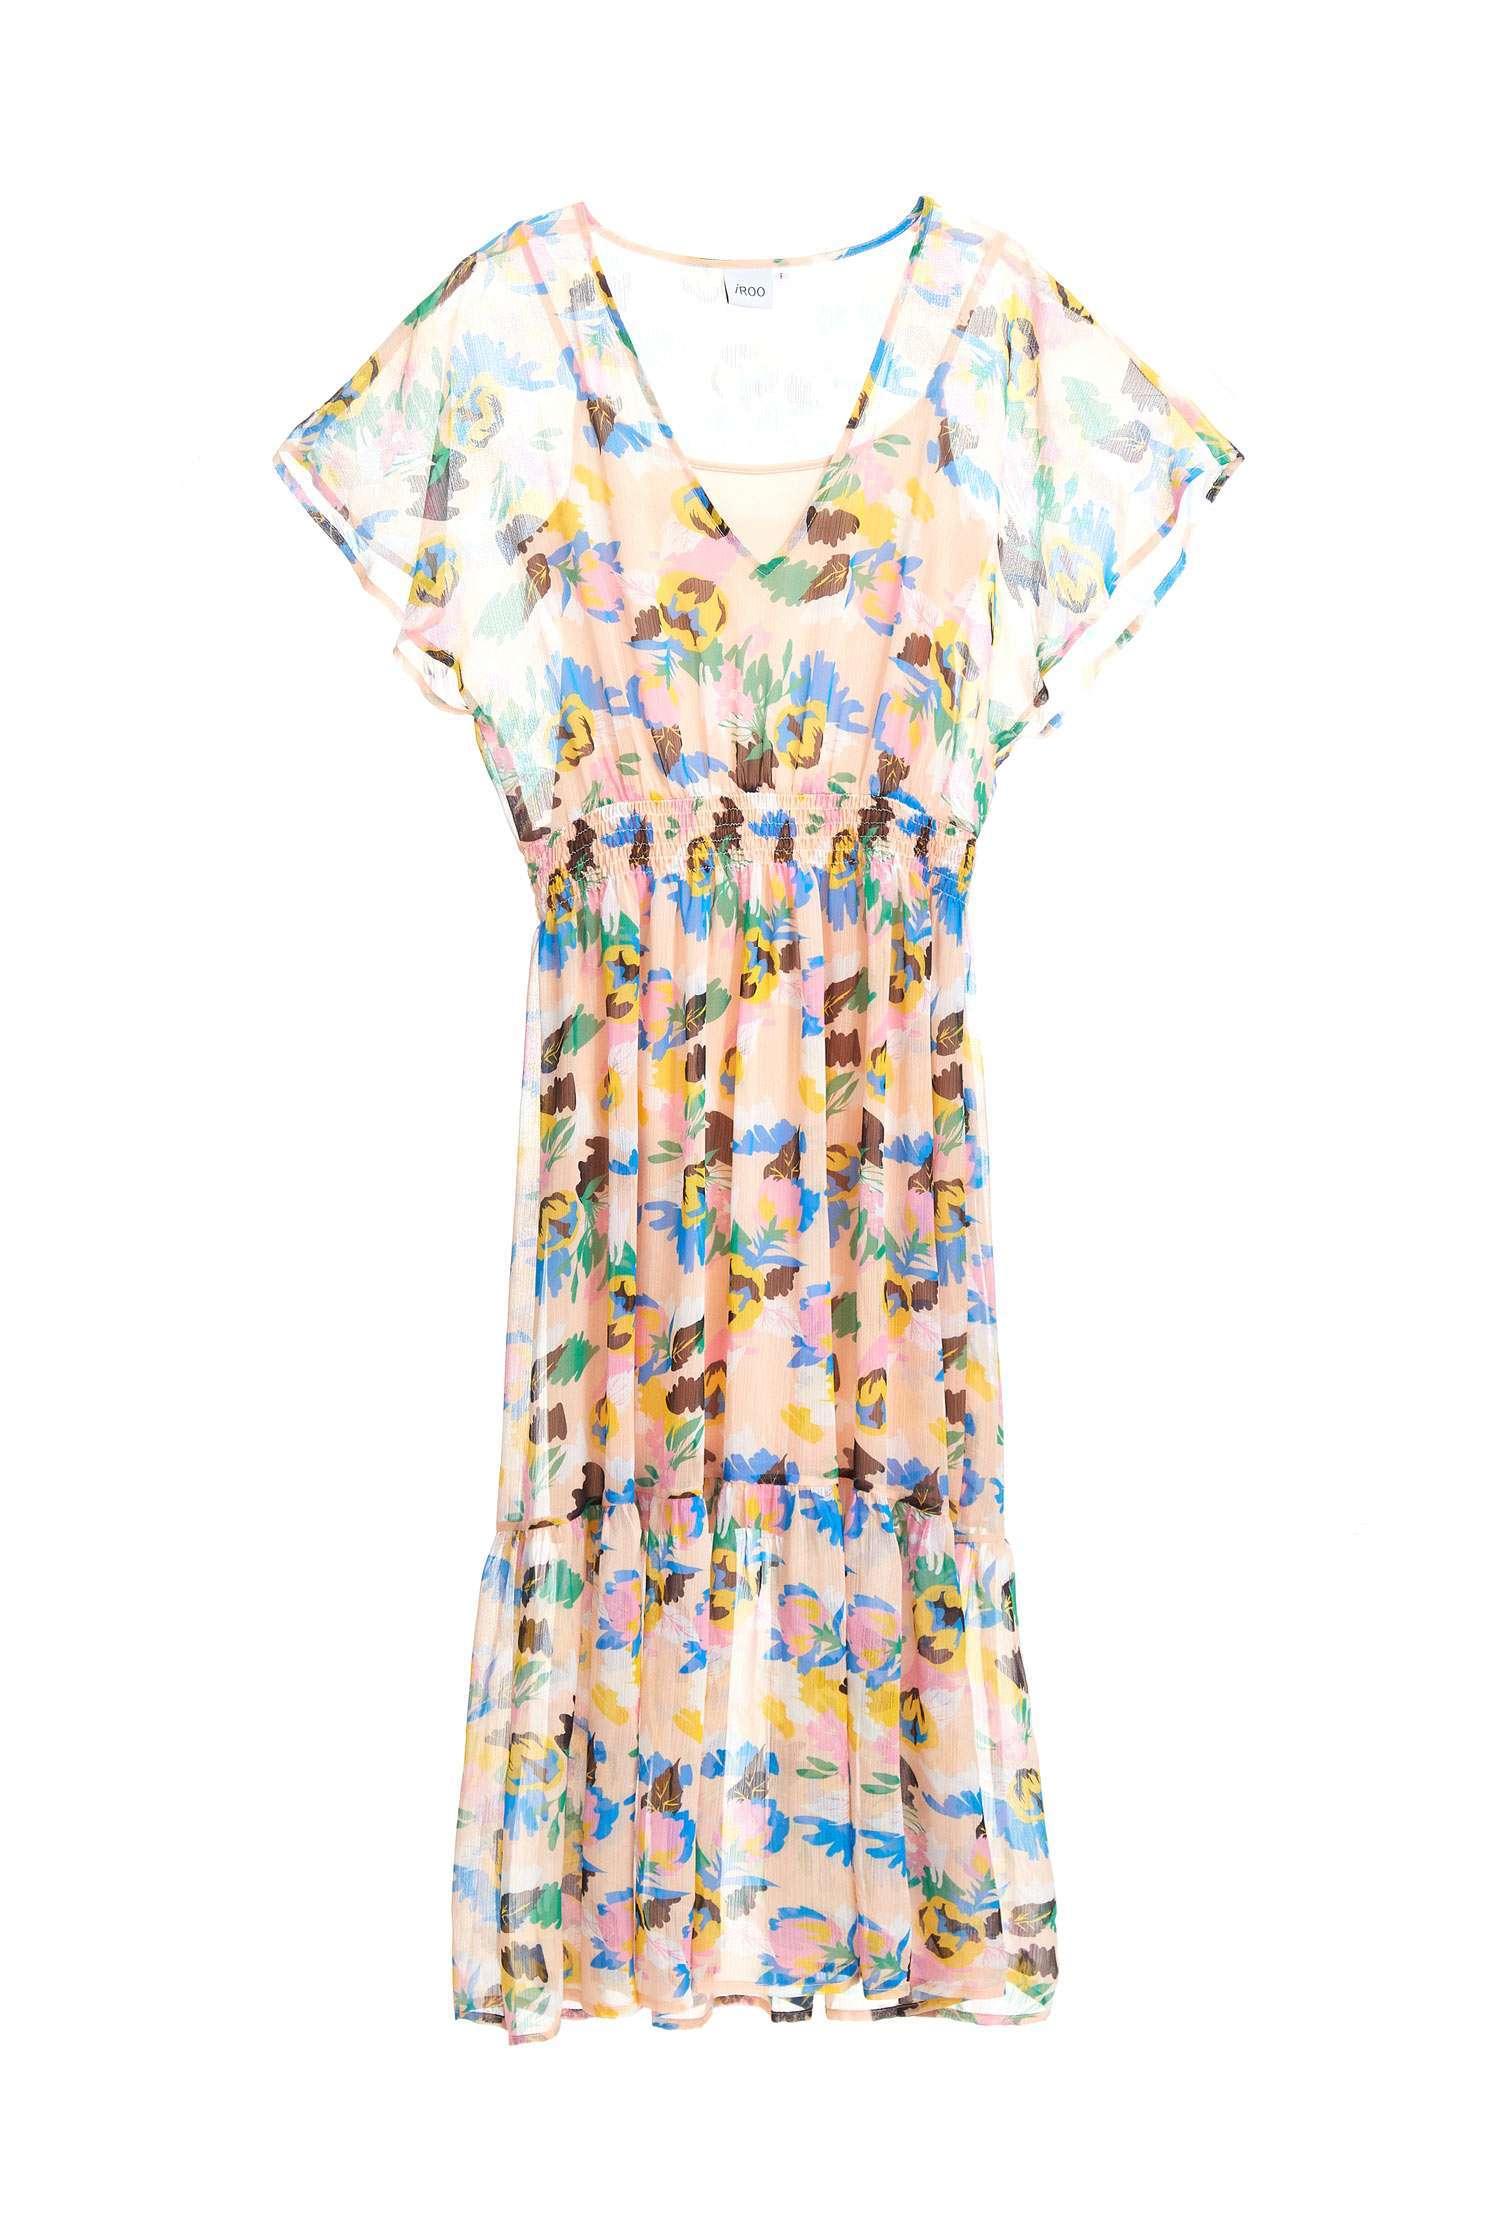 Floral chiffon dress,v-neckdress,cocktaildress,shortsleevedress,chiffon,chiffondress